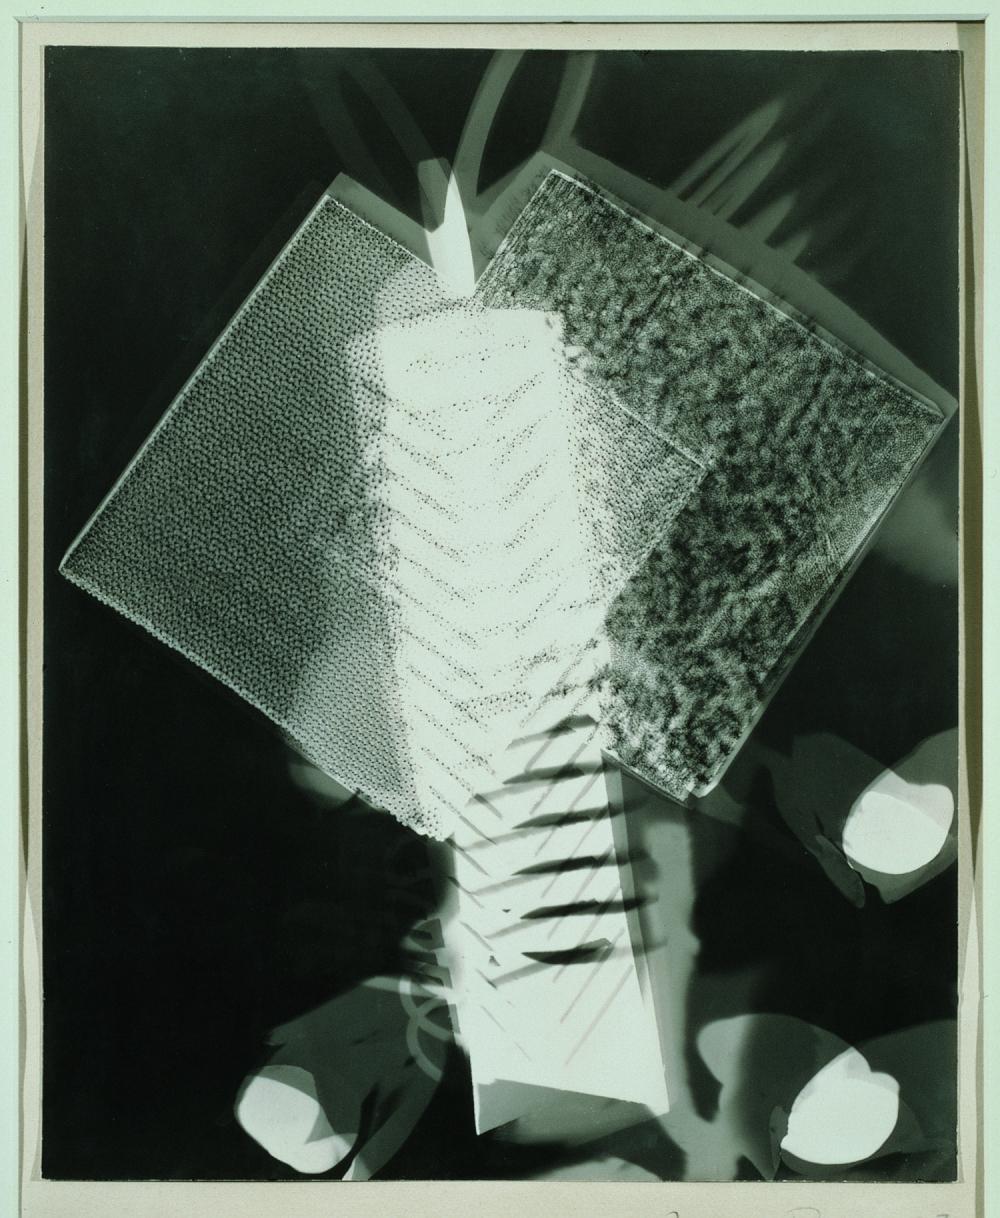 Man Ray (Emmanuel Radnitsky; Filadelfia 1890-Parigi 1976) Senza titolo, 1923